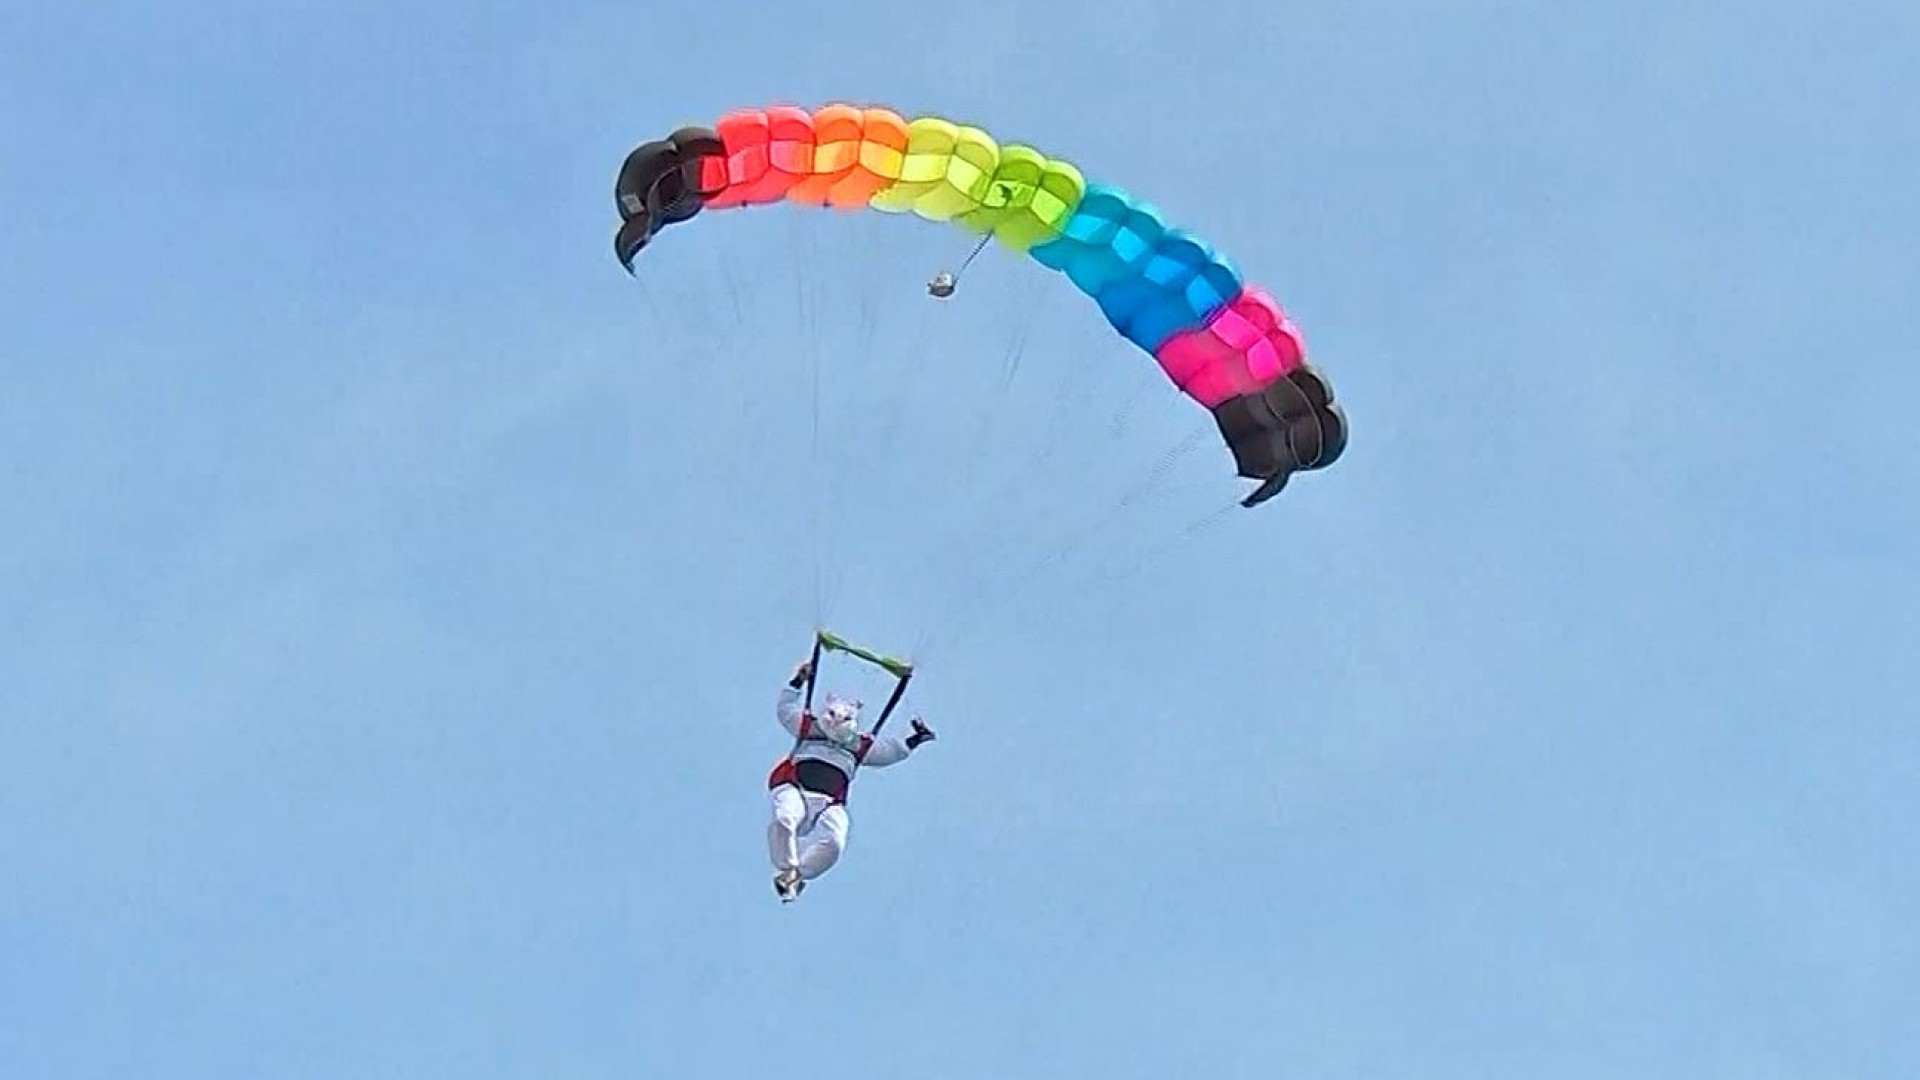 WATCH: Easter Bunny goes skydiving, surprises kids during egg hunt